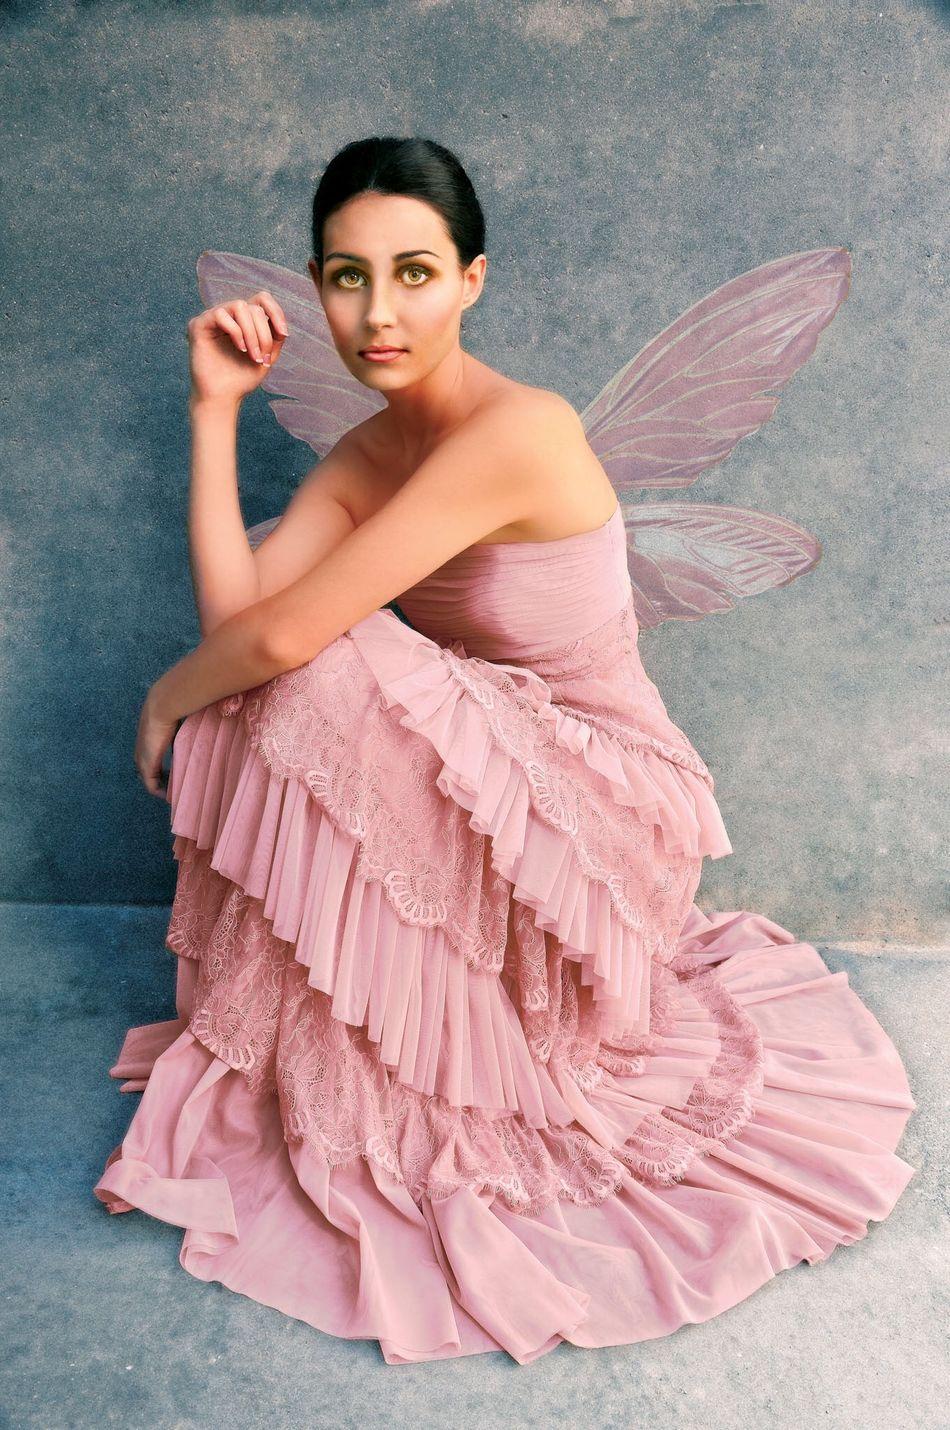 Beautiful stock photos of fashion, 20-24 Years, Beautiful People, Beautiful Woman, Caucasian Ethnicity